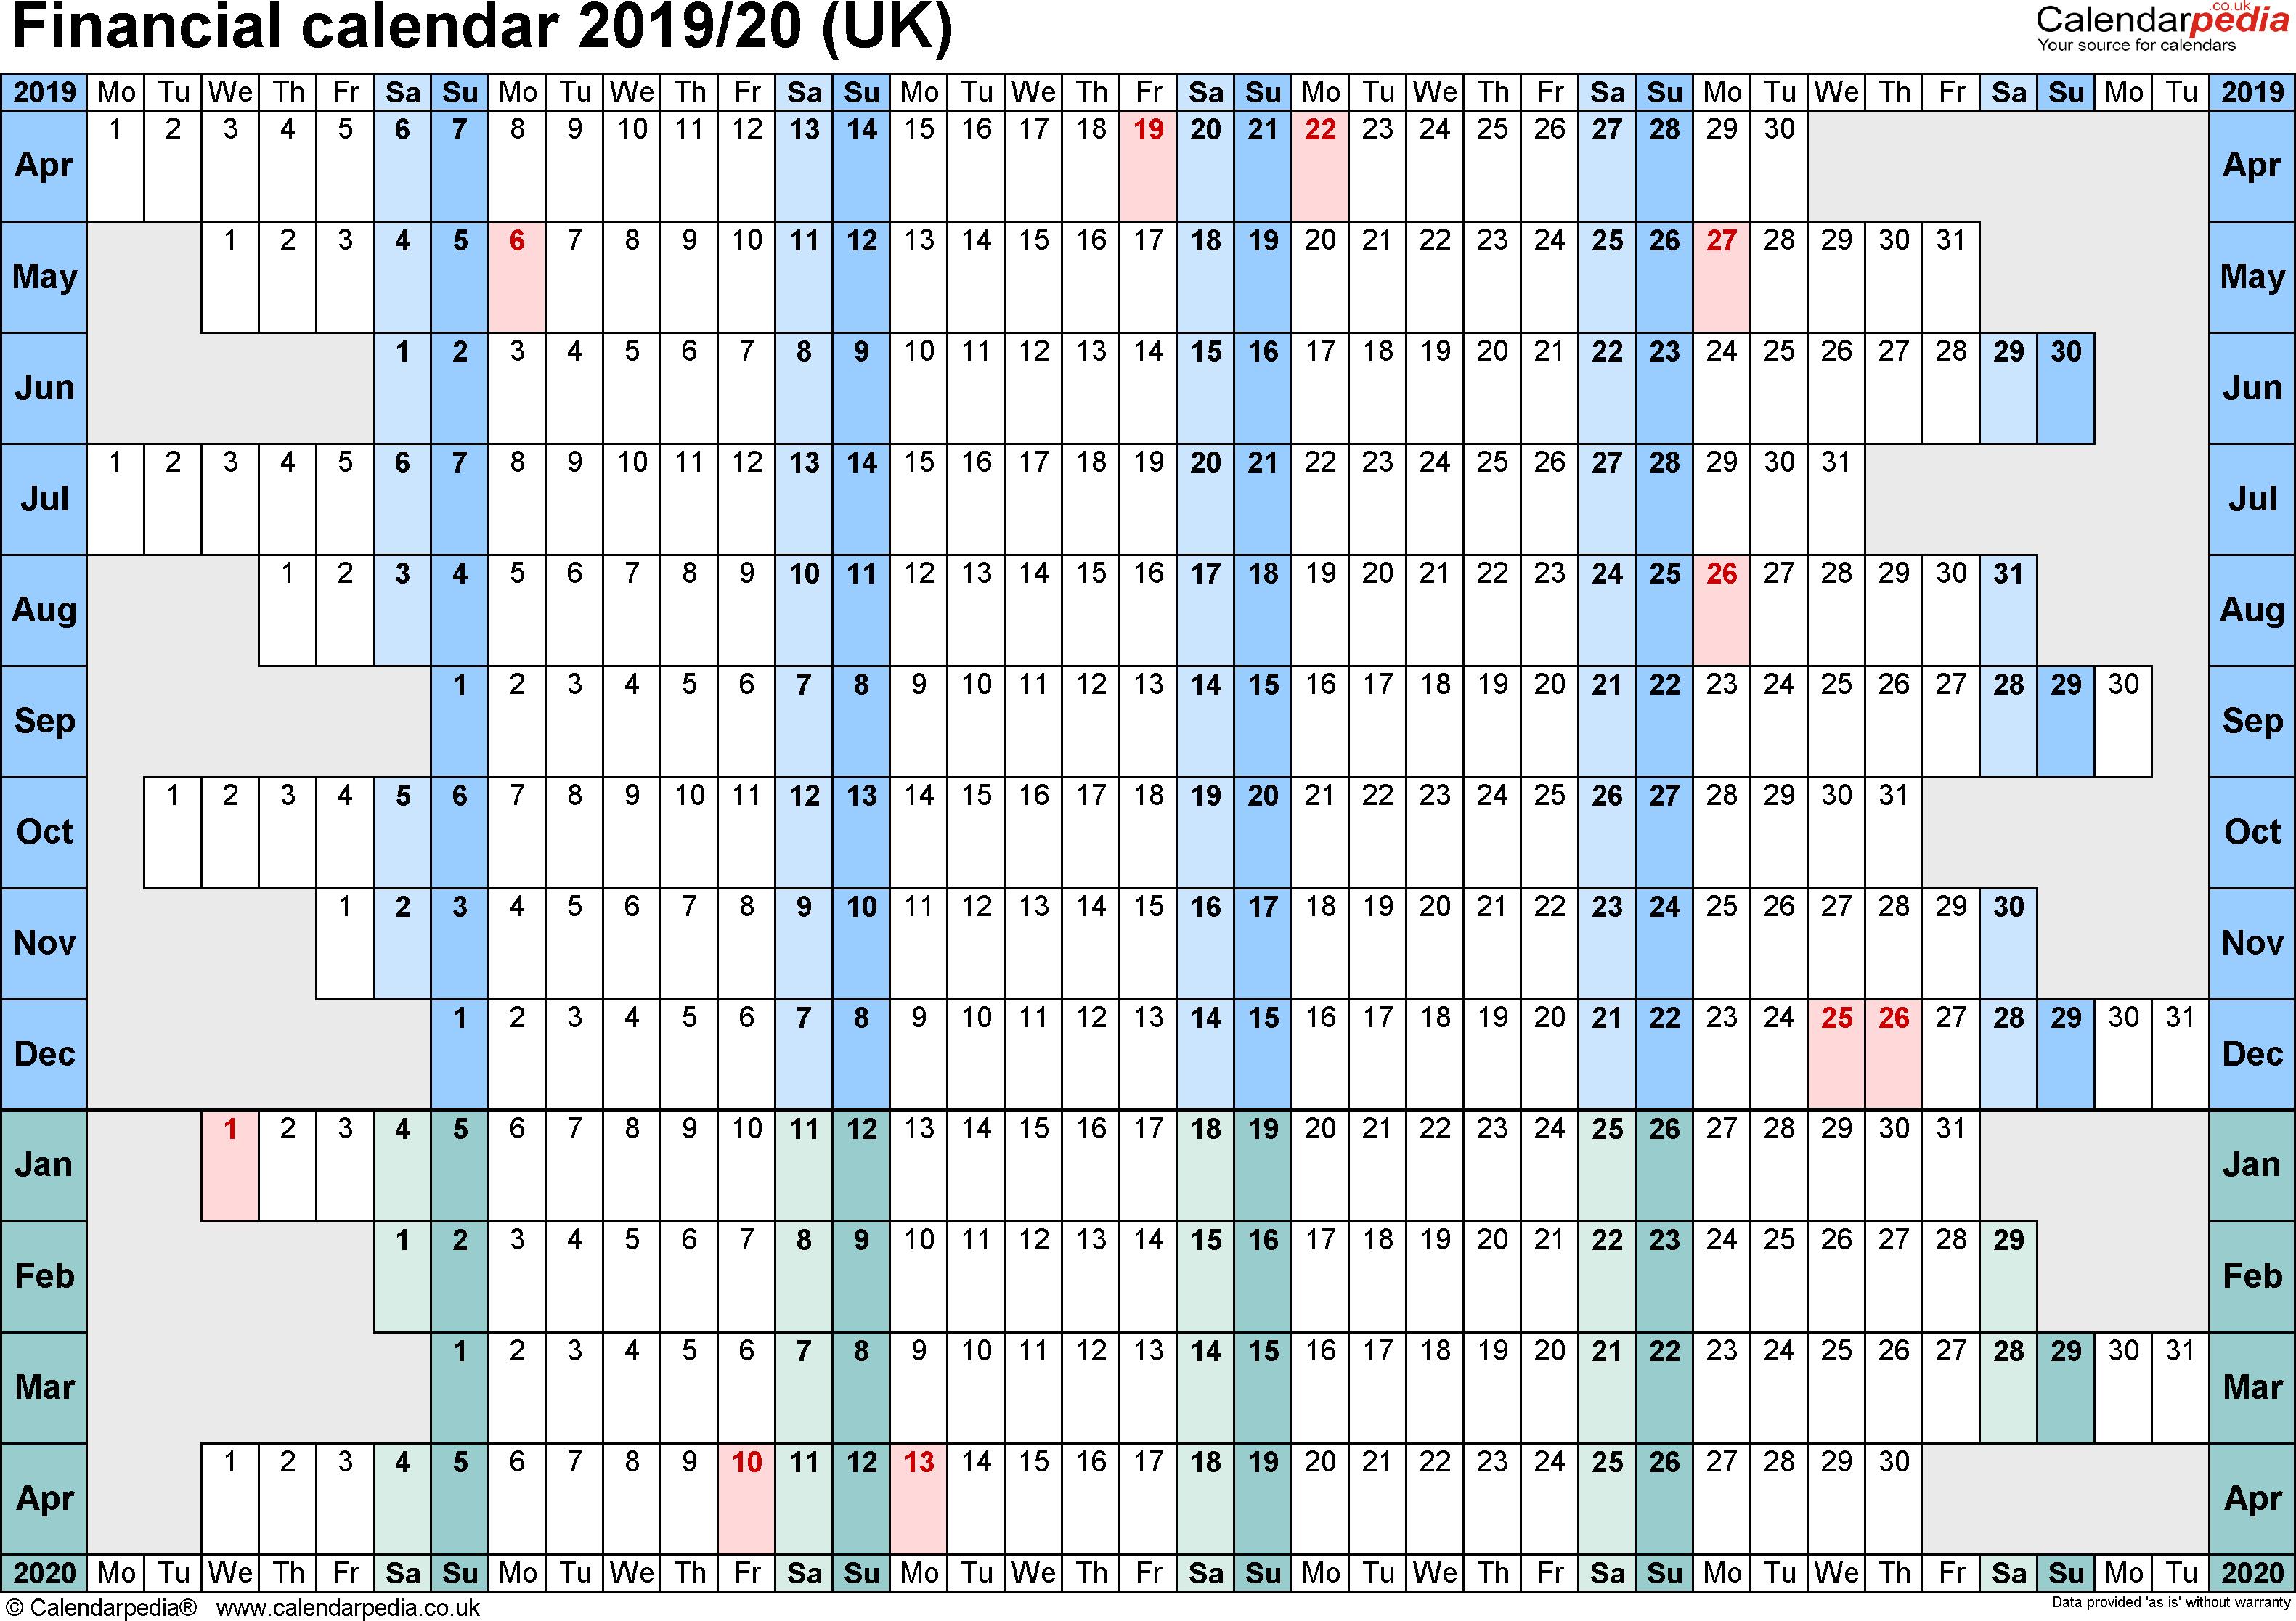 Financial Calendars 2019/20 (Uk) In Pdf Format inside Hmrc Tax Weekly Calander 2019-2020